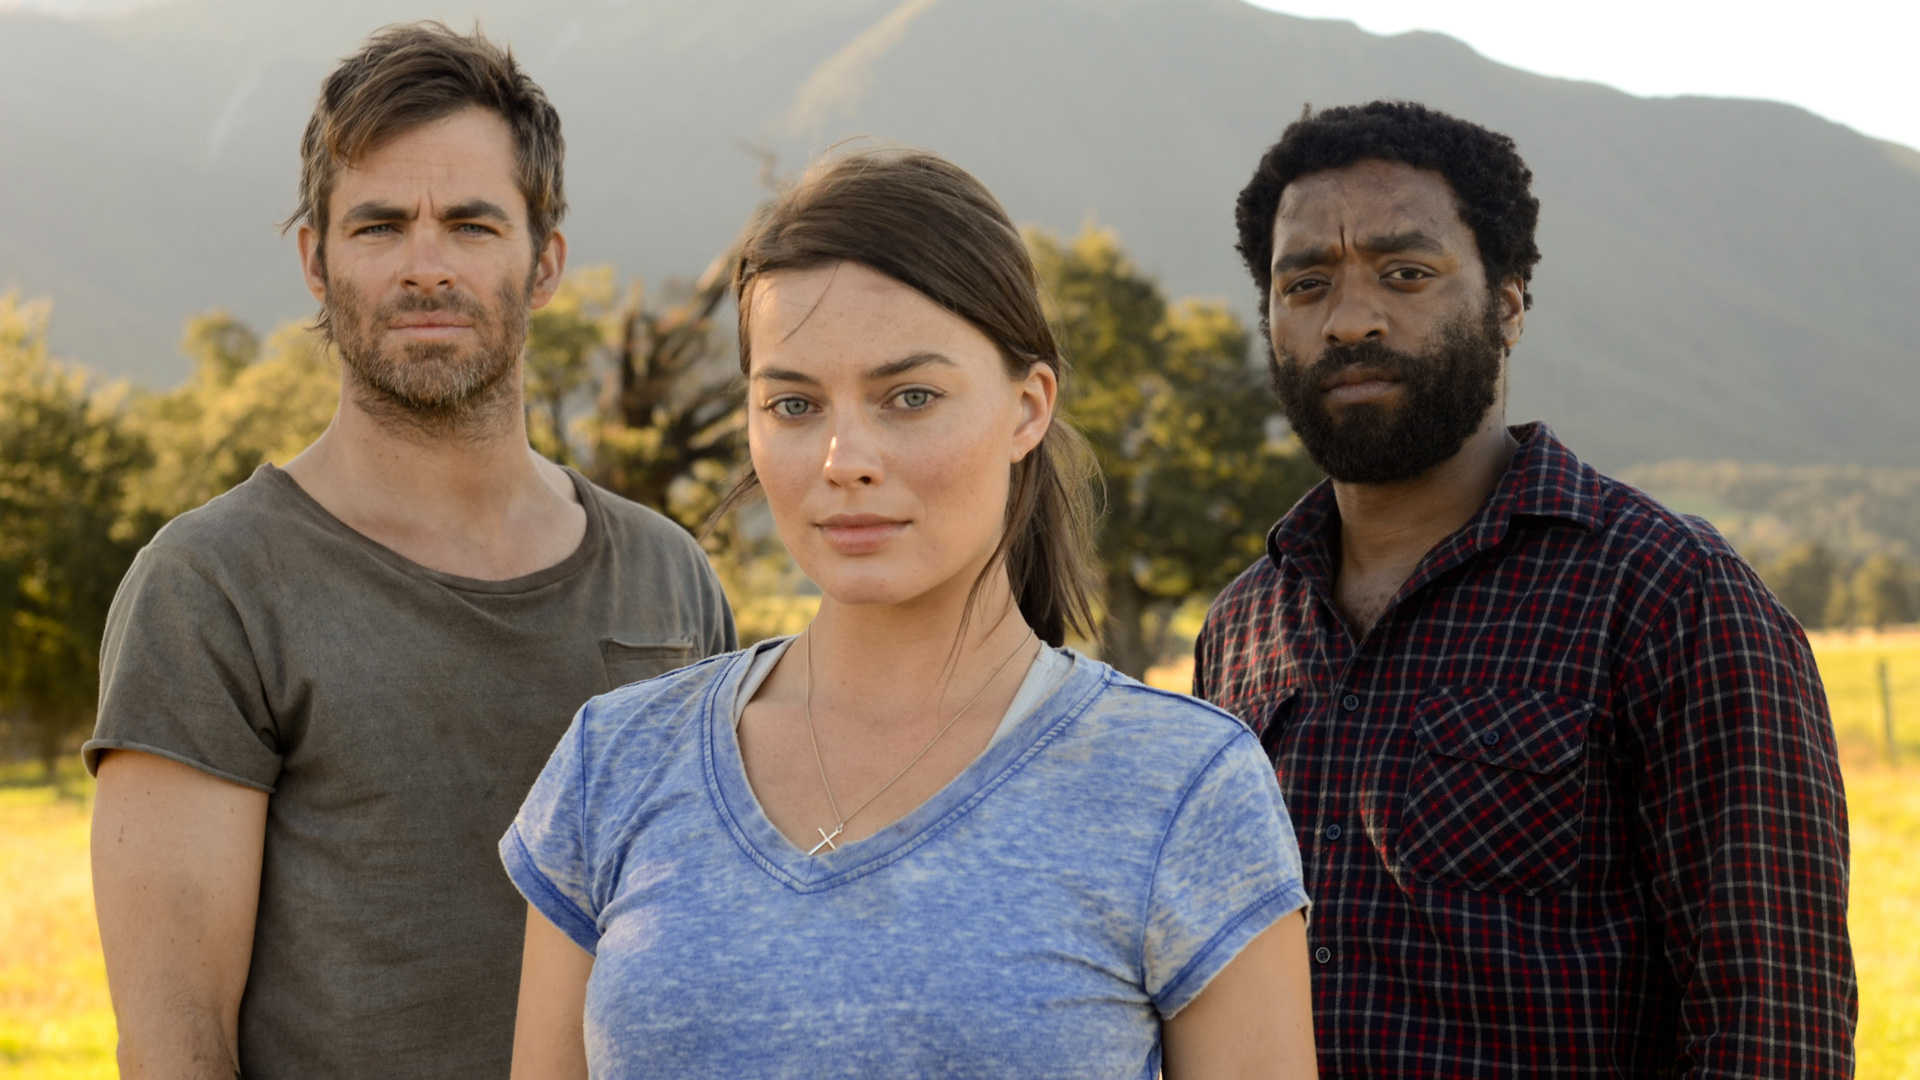 Caleb (Chris Pine), Ann Burden (Margot Robbie) and John Loomis (Chiwetel Ejiofor) in Z for Zachariah (2015)